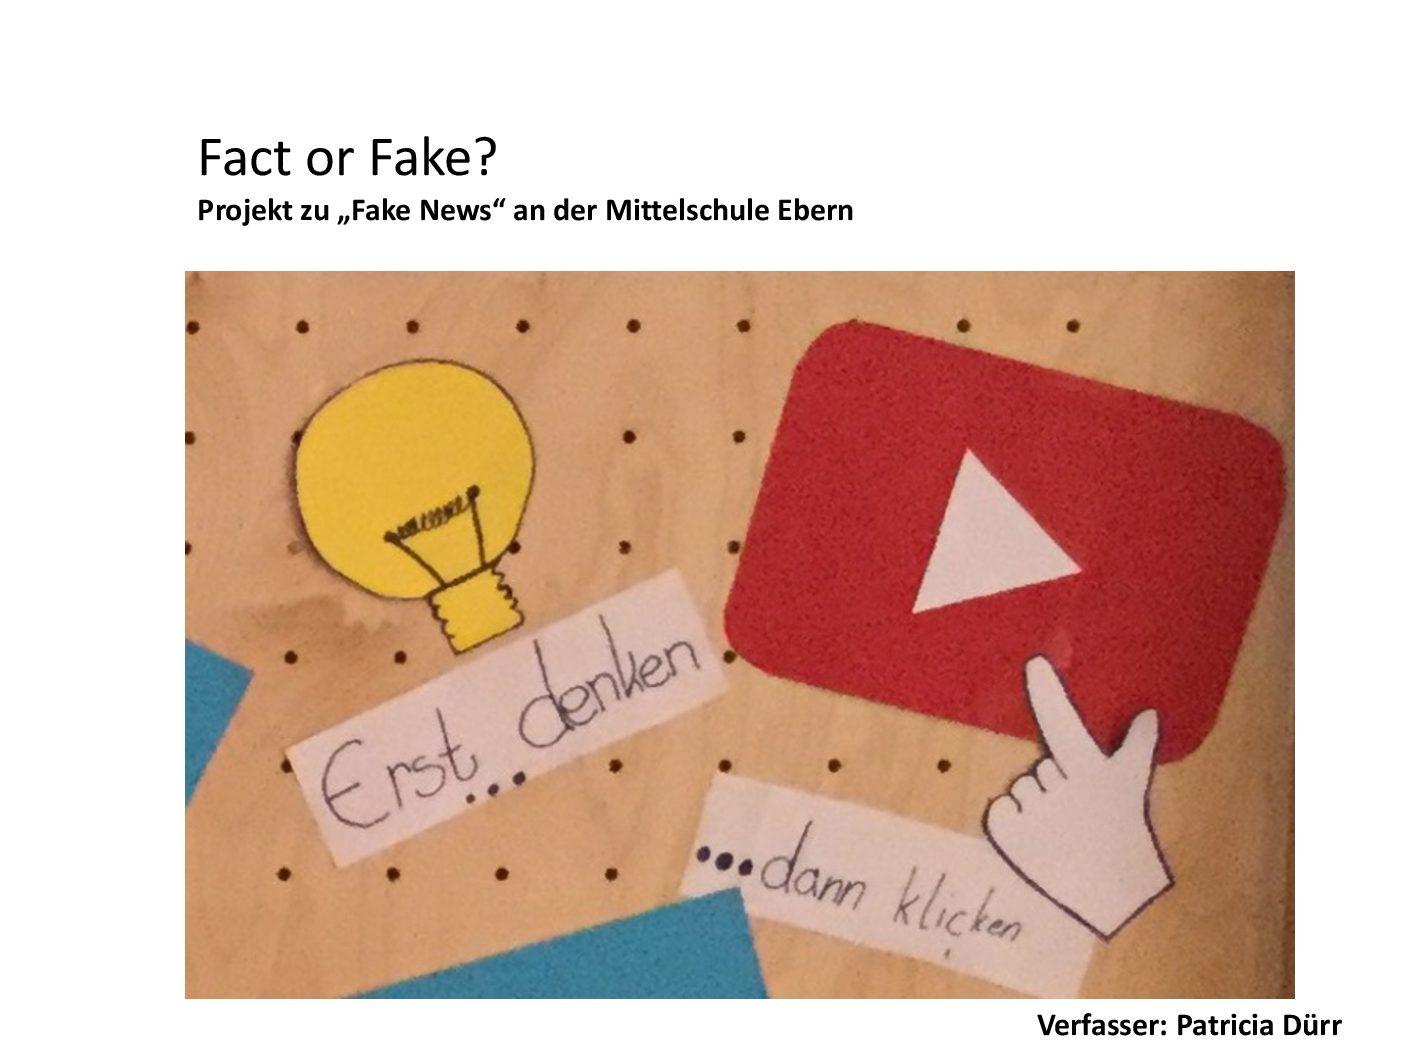 Dokumentation fact or fake